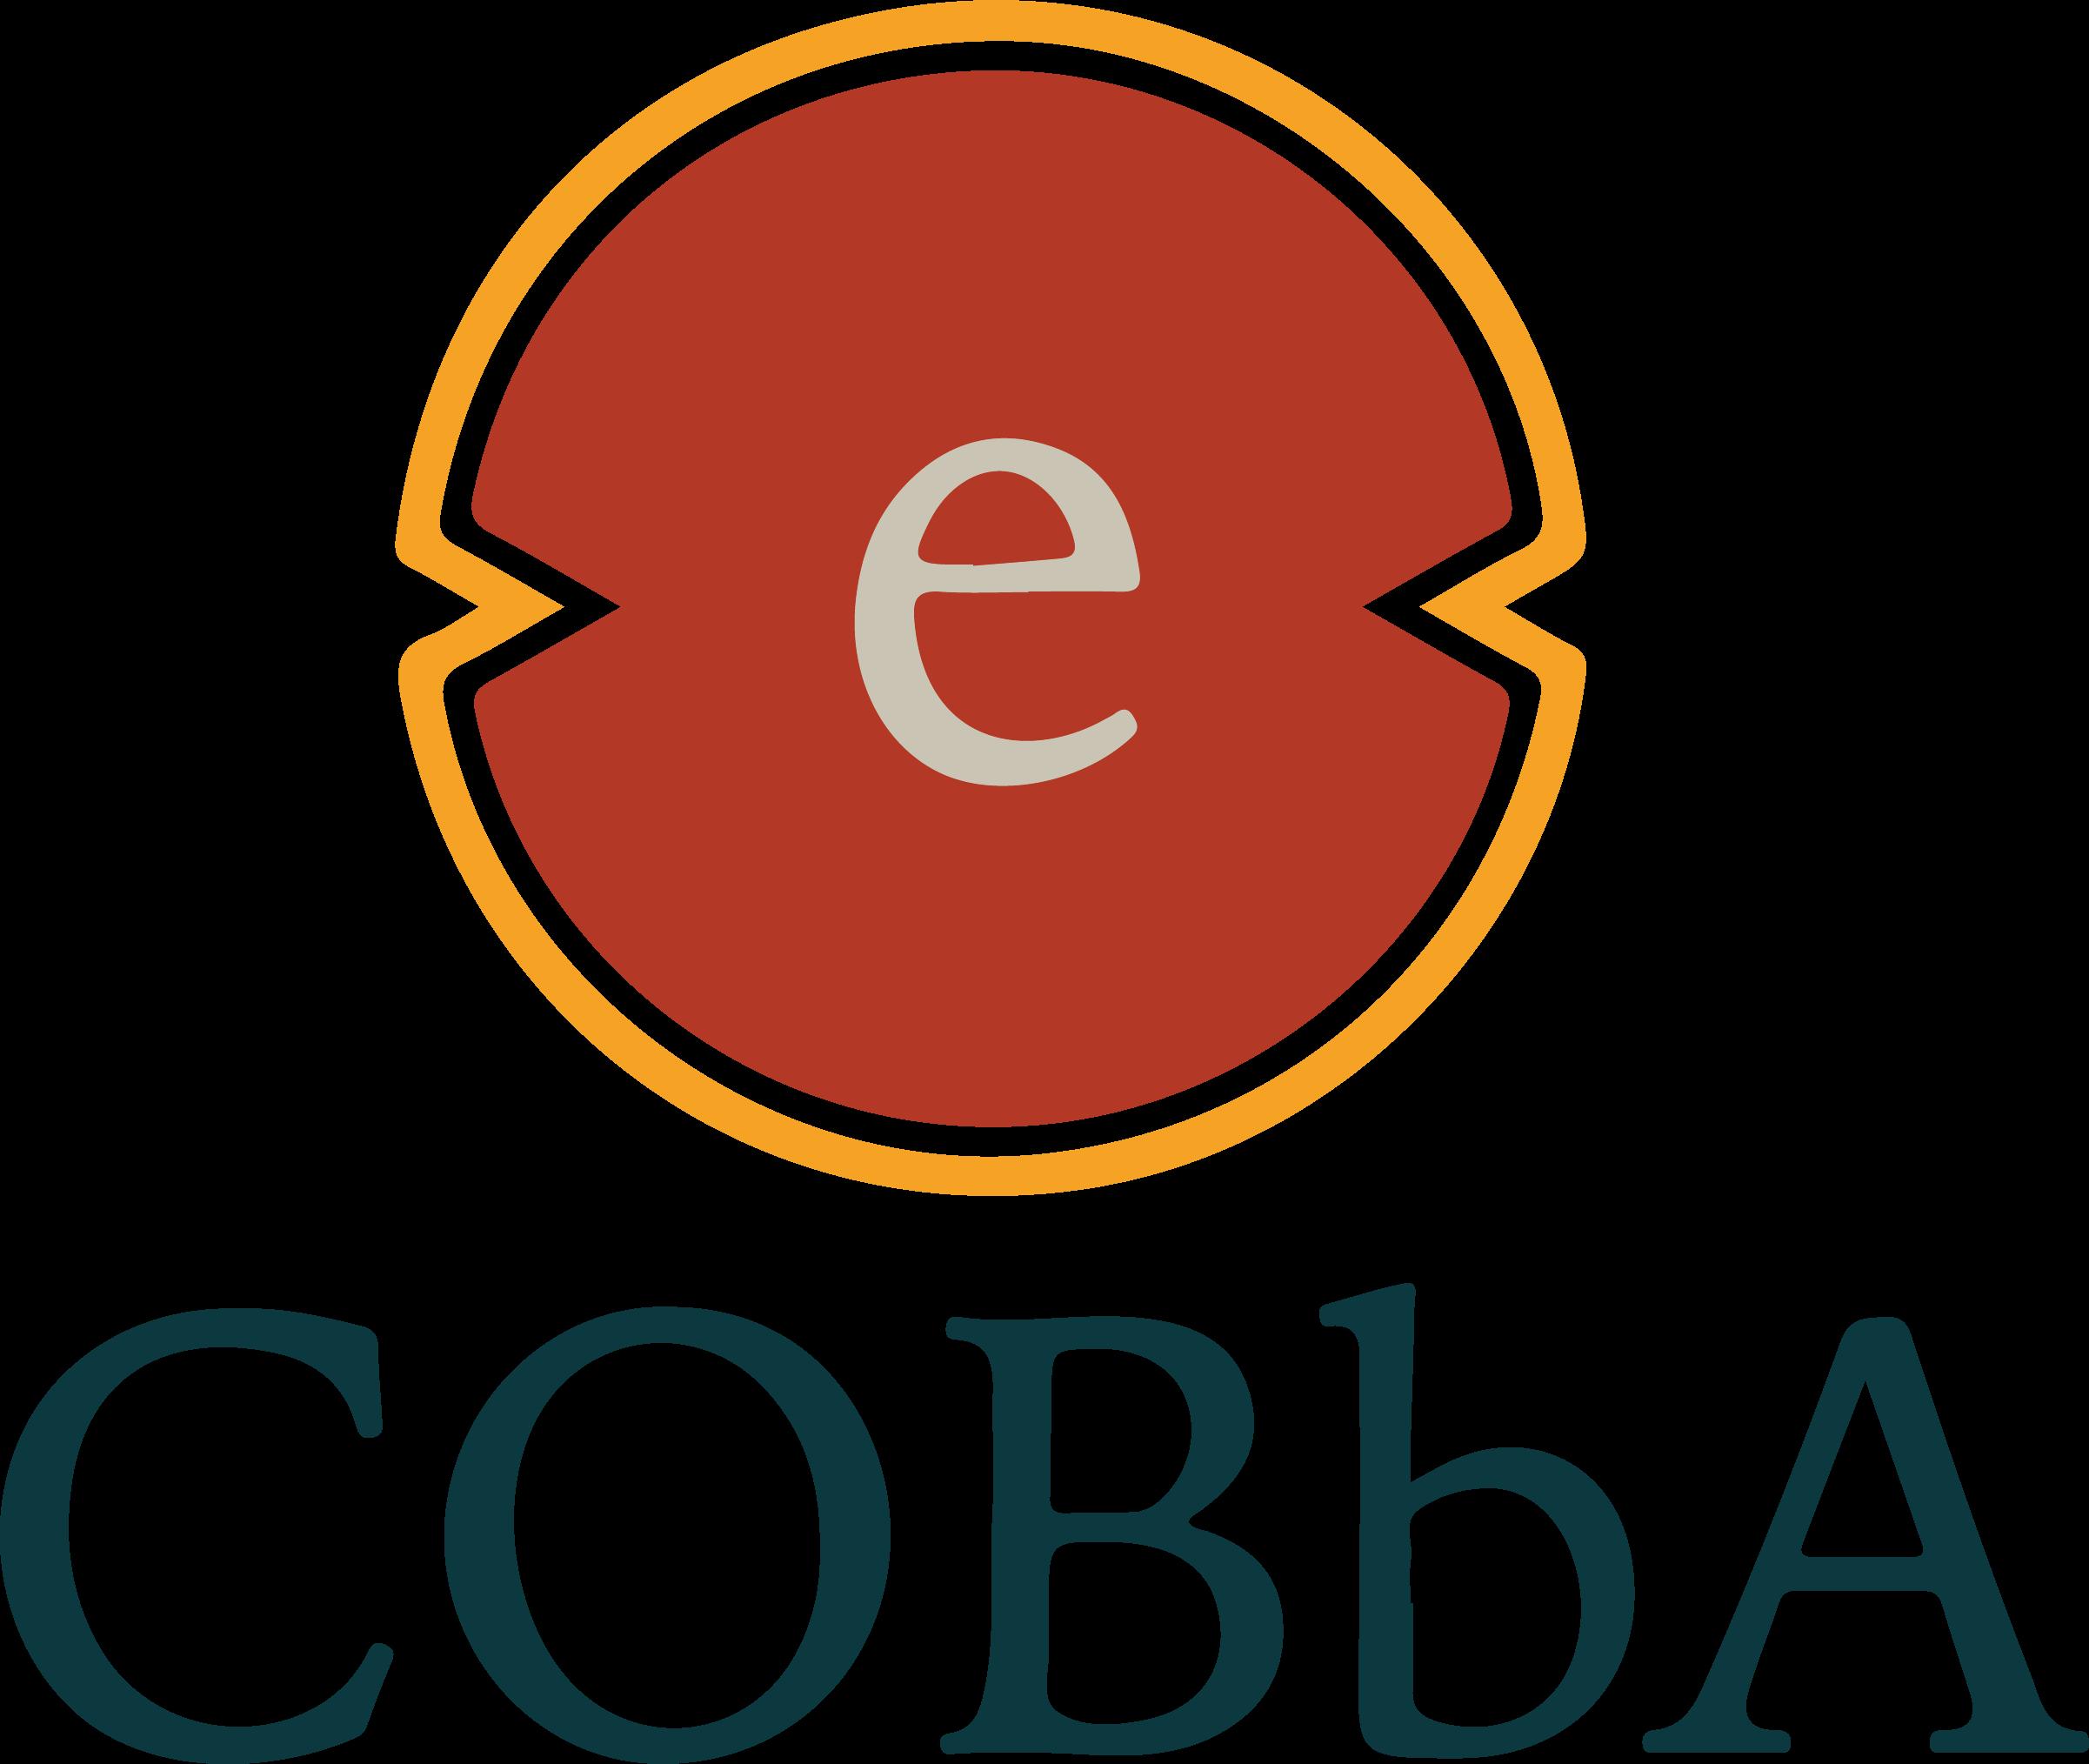 Ecobba Logo